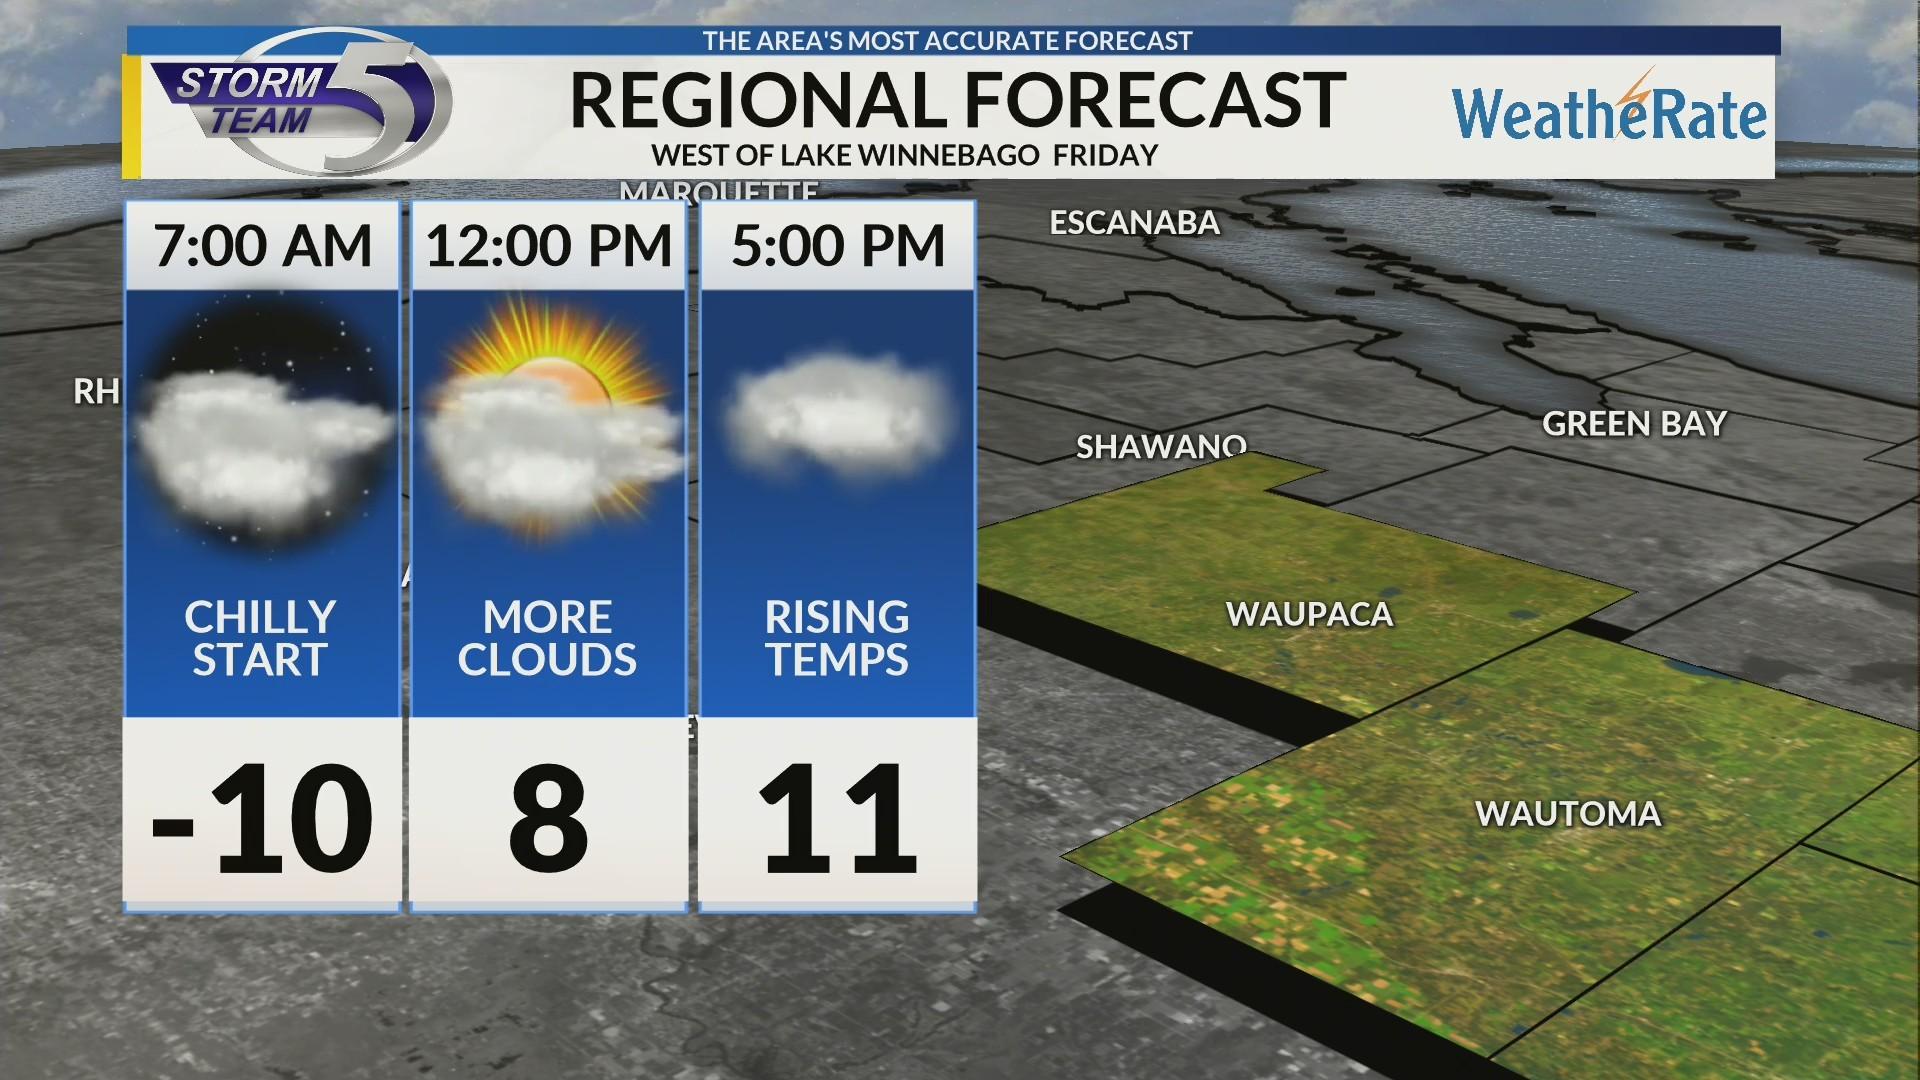 Regional Forecast: Areas West of Lake Winnebago 2/1